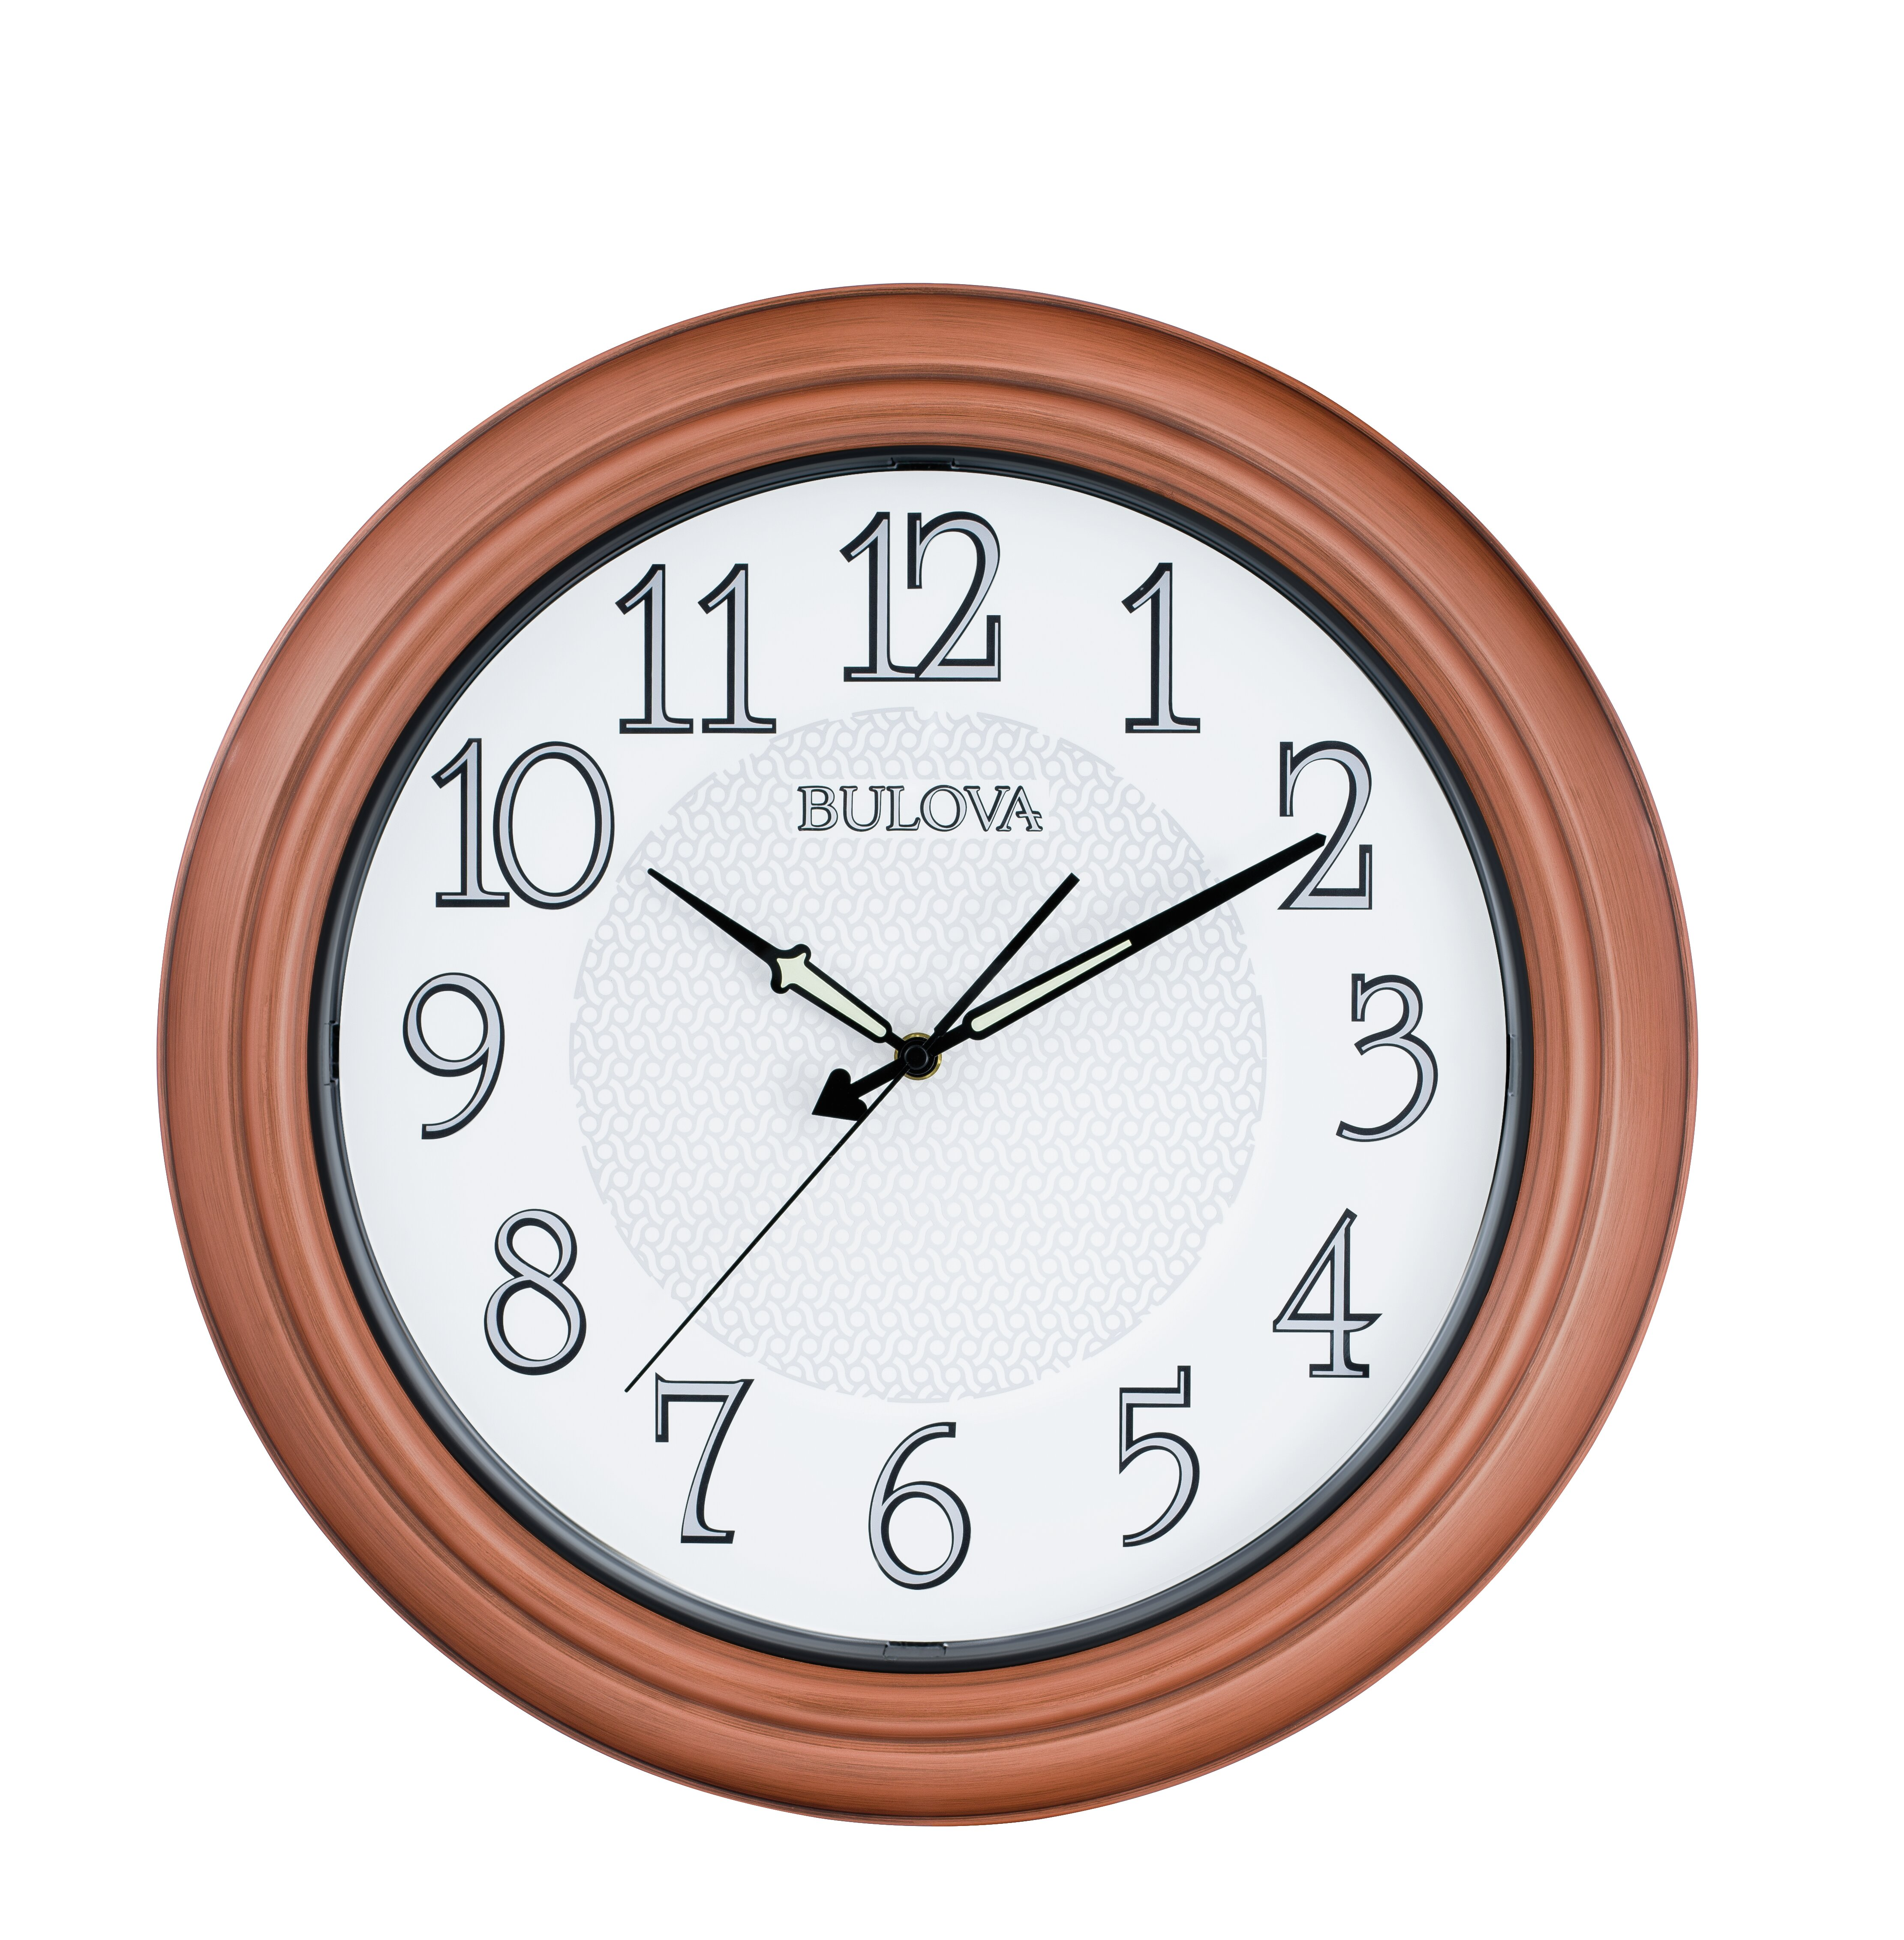 x 24 in Bulova Wall Clock 24 in Round Non-Ticking Wood Analog Quartz Black